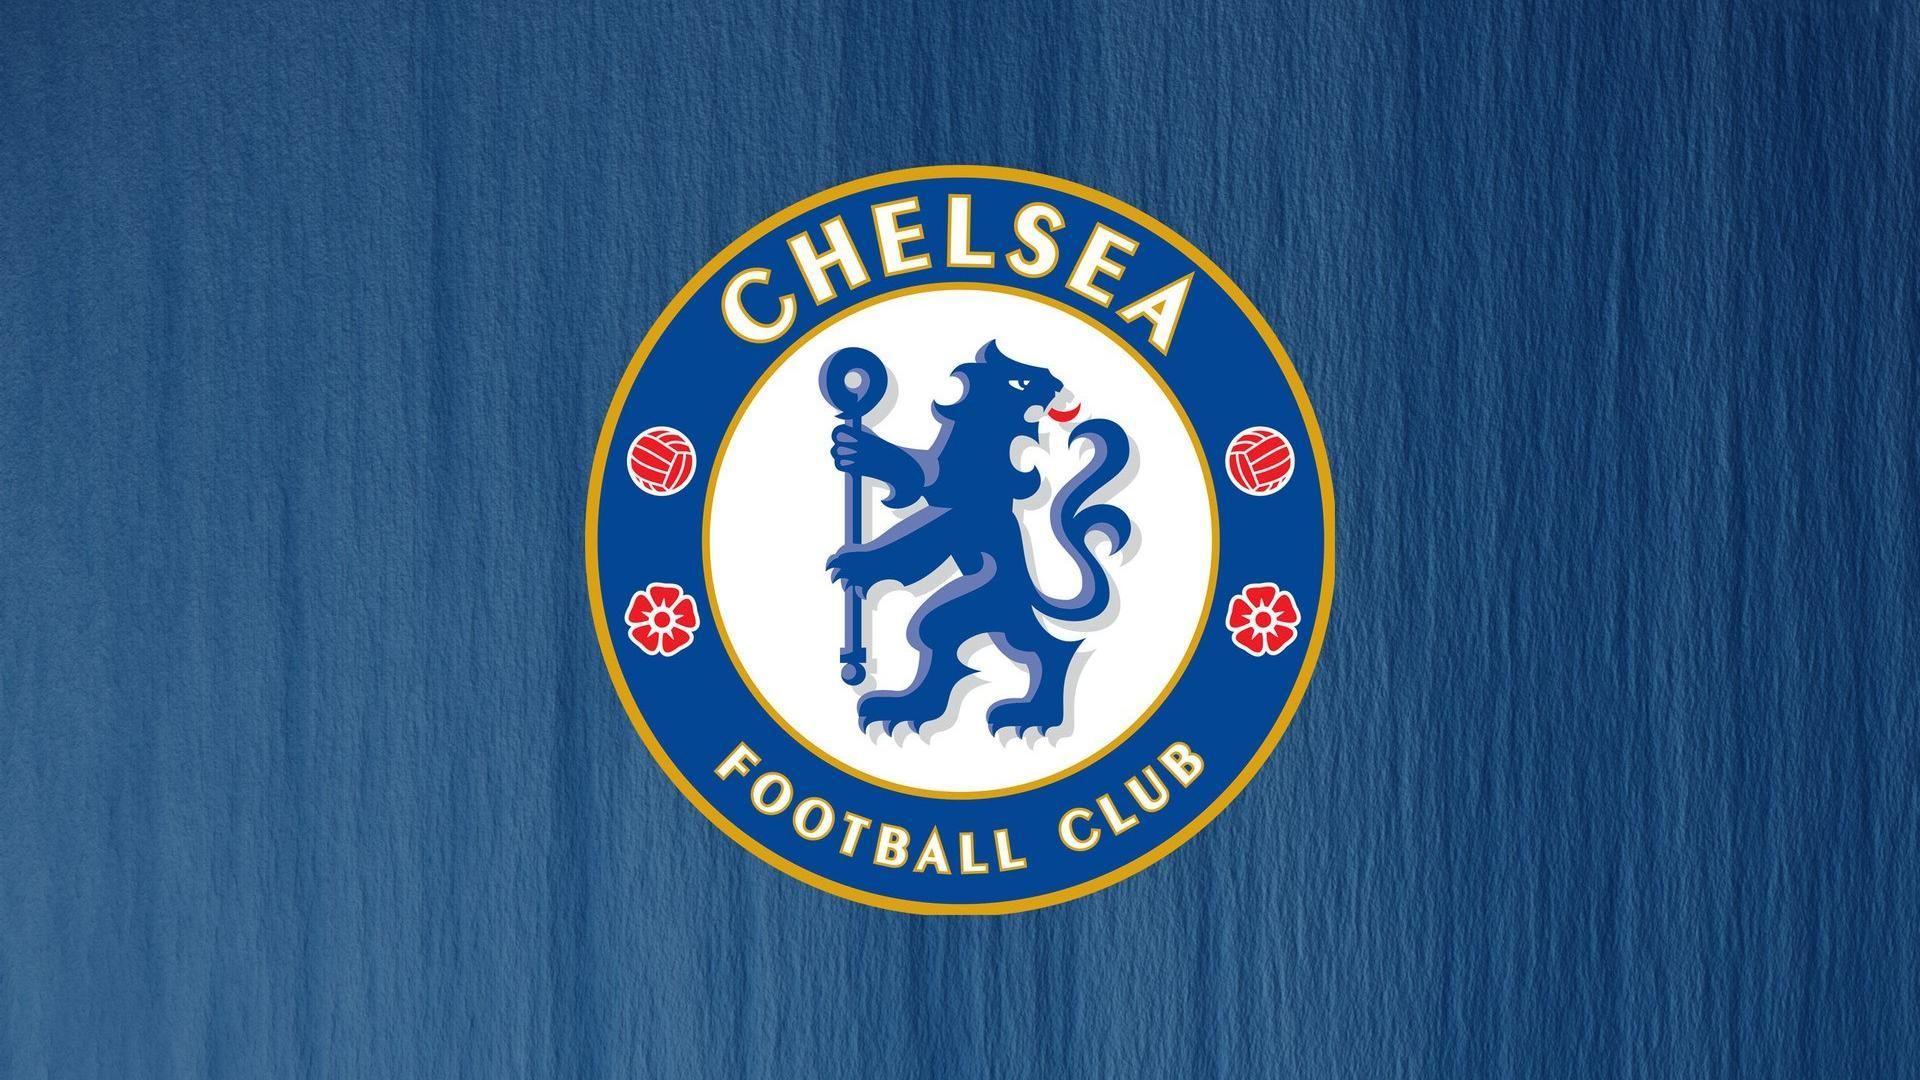 Hd wallpaper sites - Chelsea Football Logo Site Pictures Footballpix